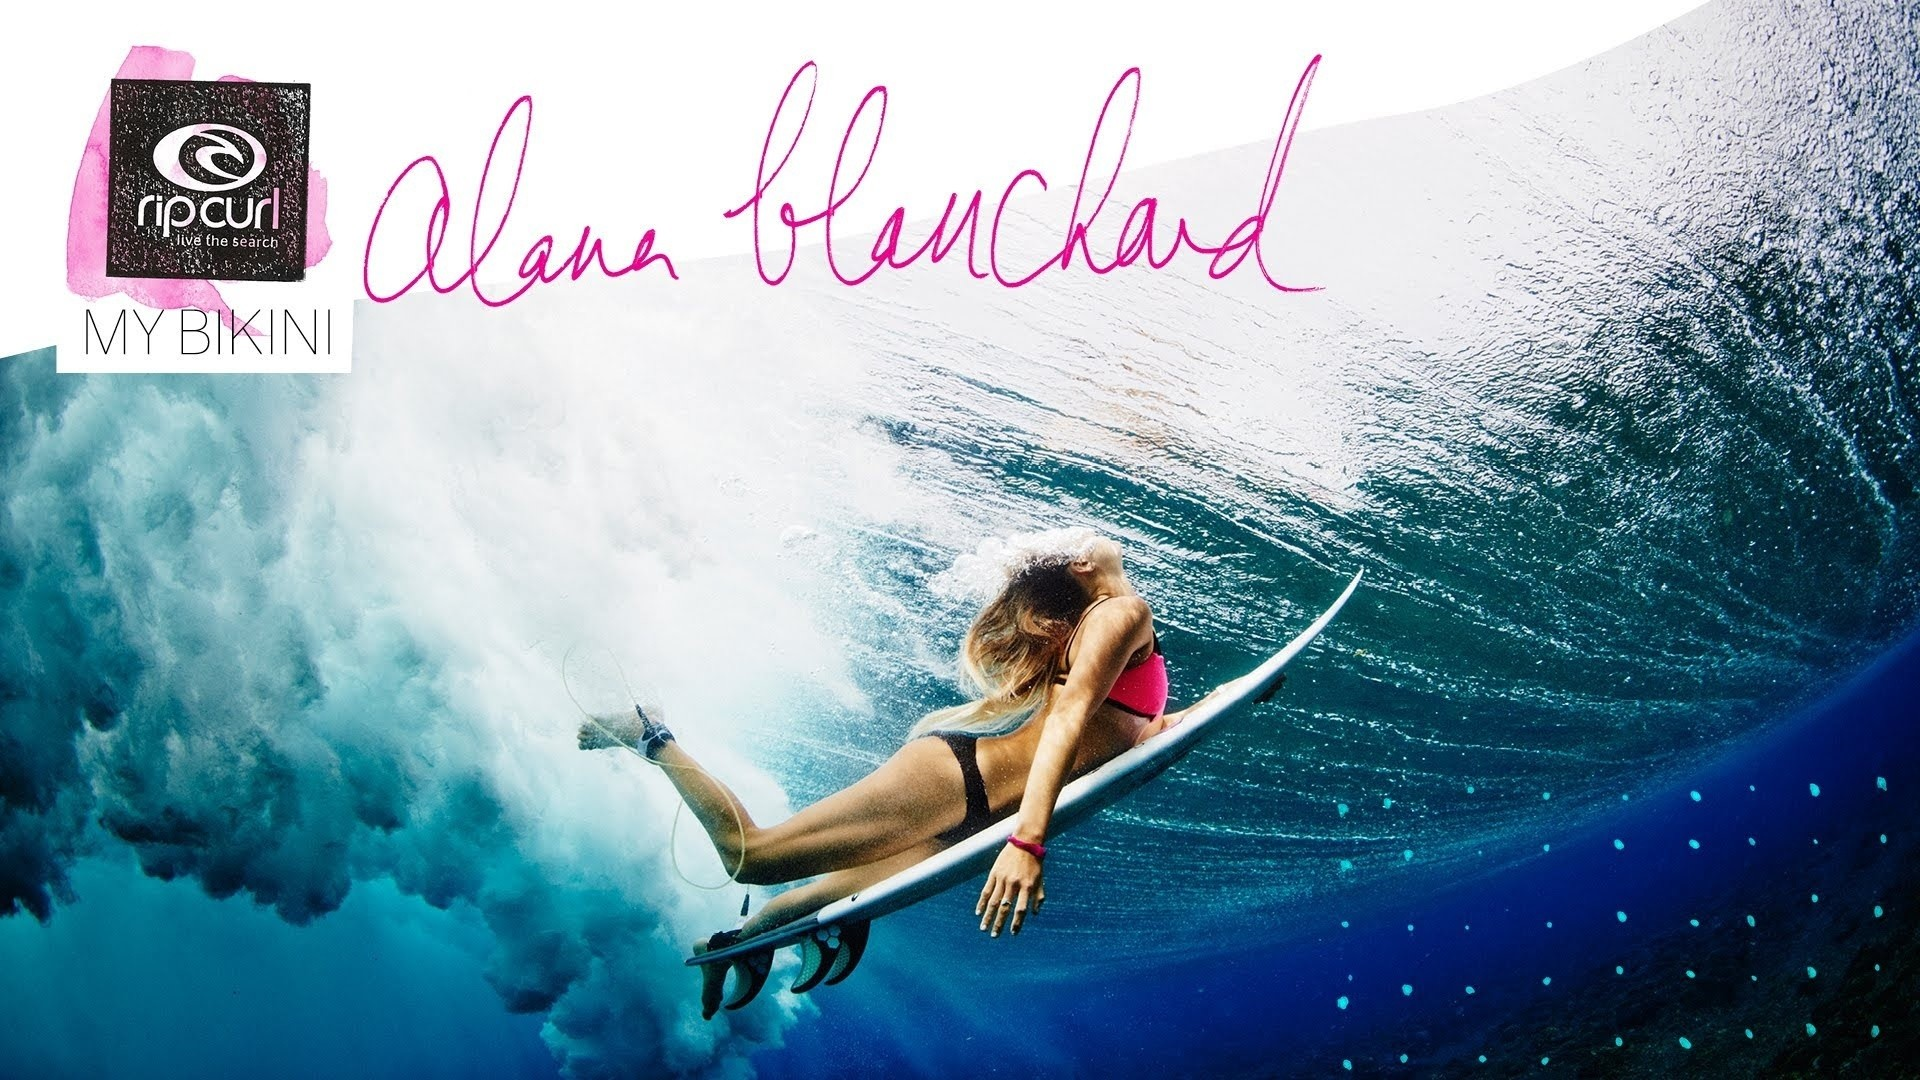 Res: 1920x1080, Motivational, Surfer, Surfing, Underwater, Surfer Girl, Alana Blanchard,  Alana Blanchard